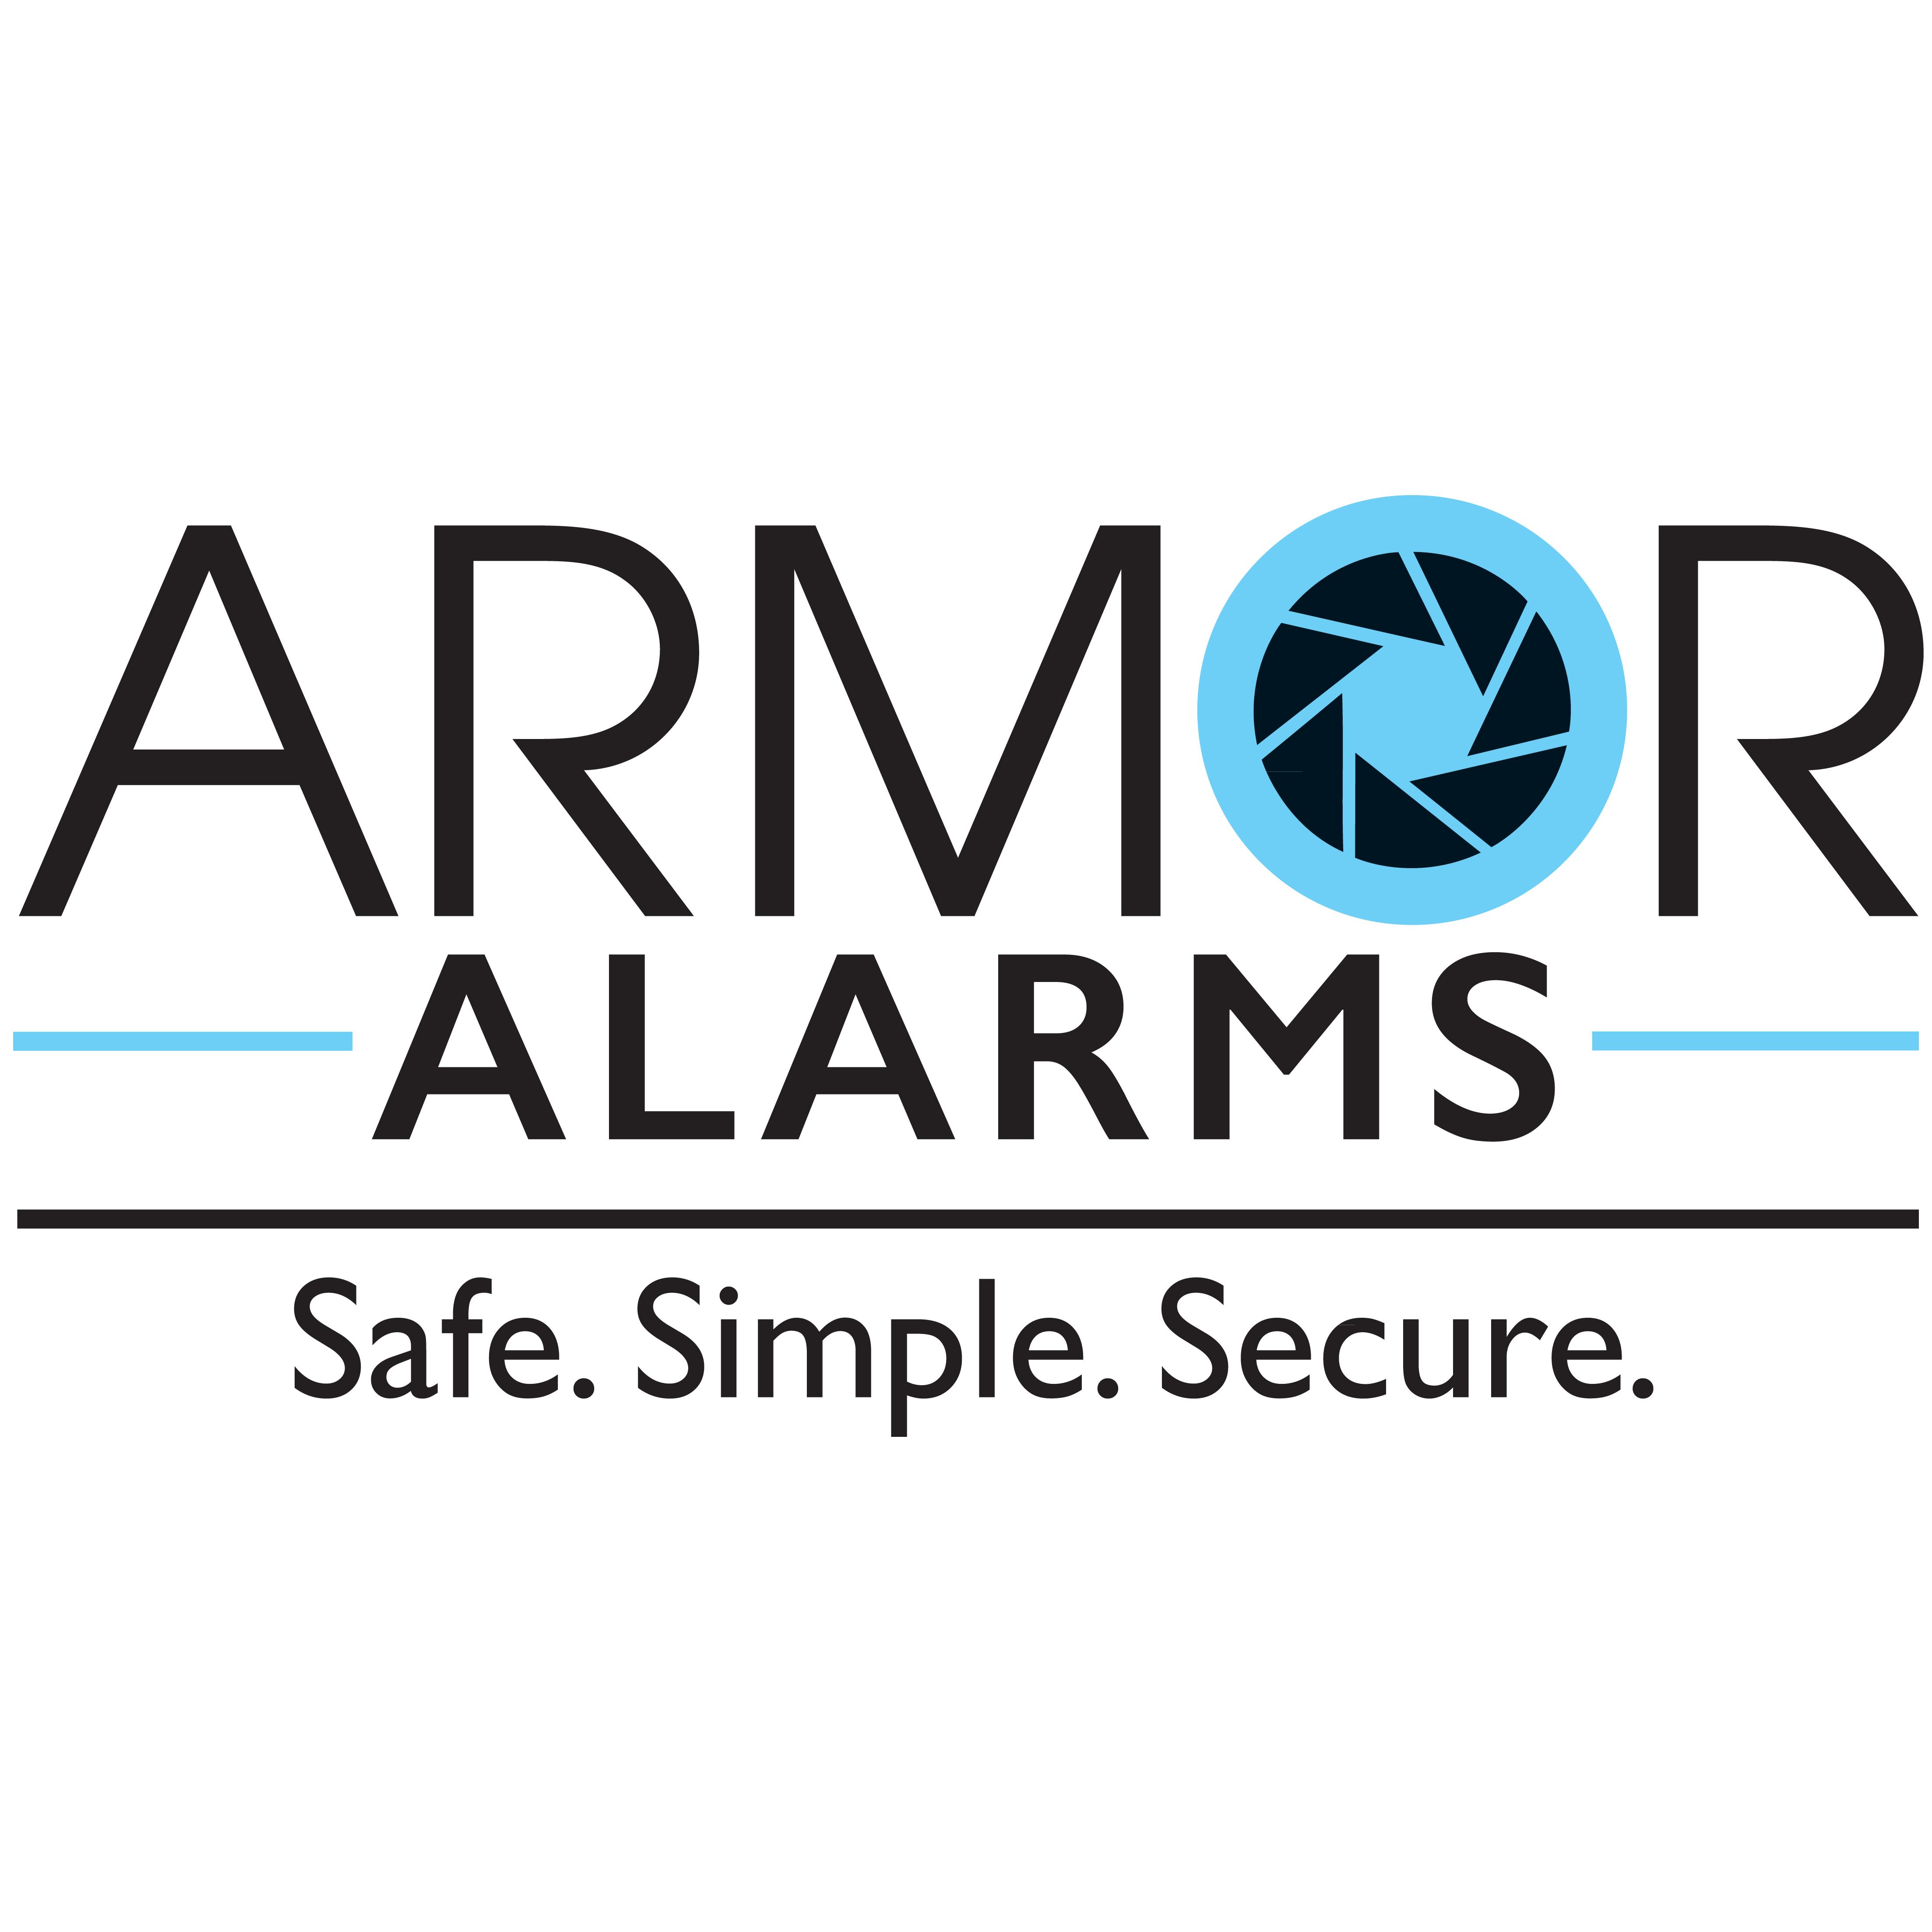 Armor Alarms